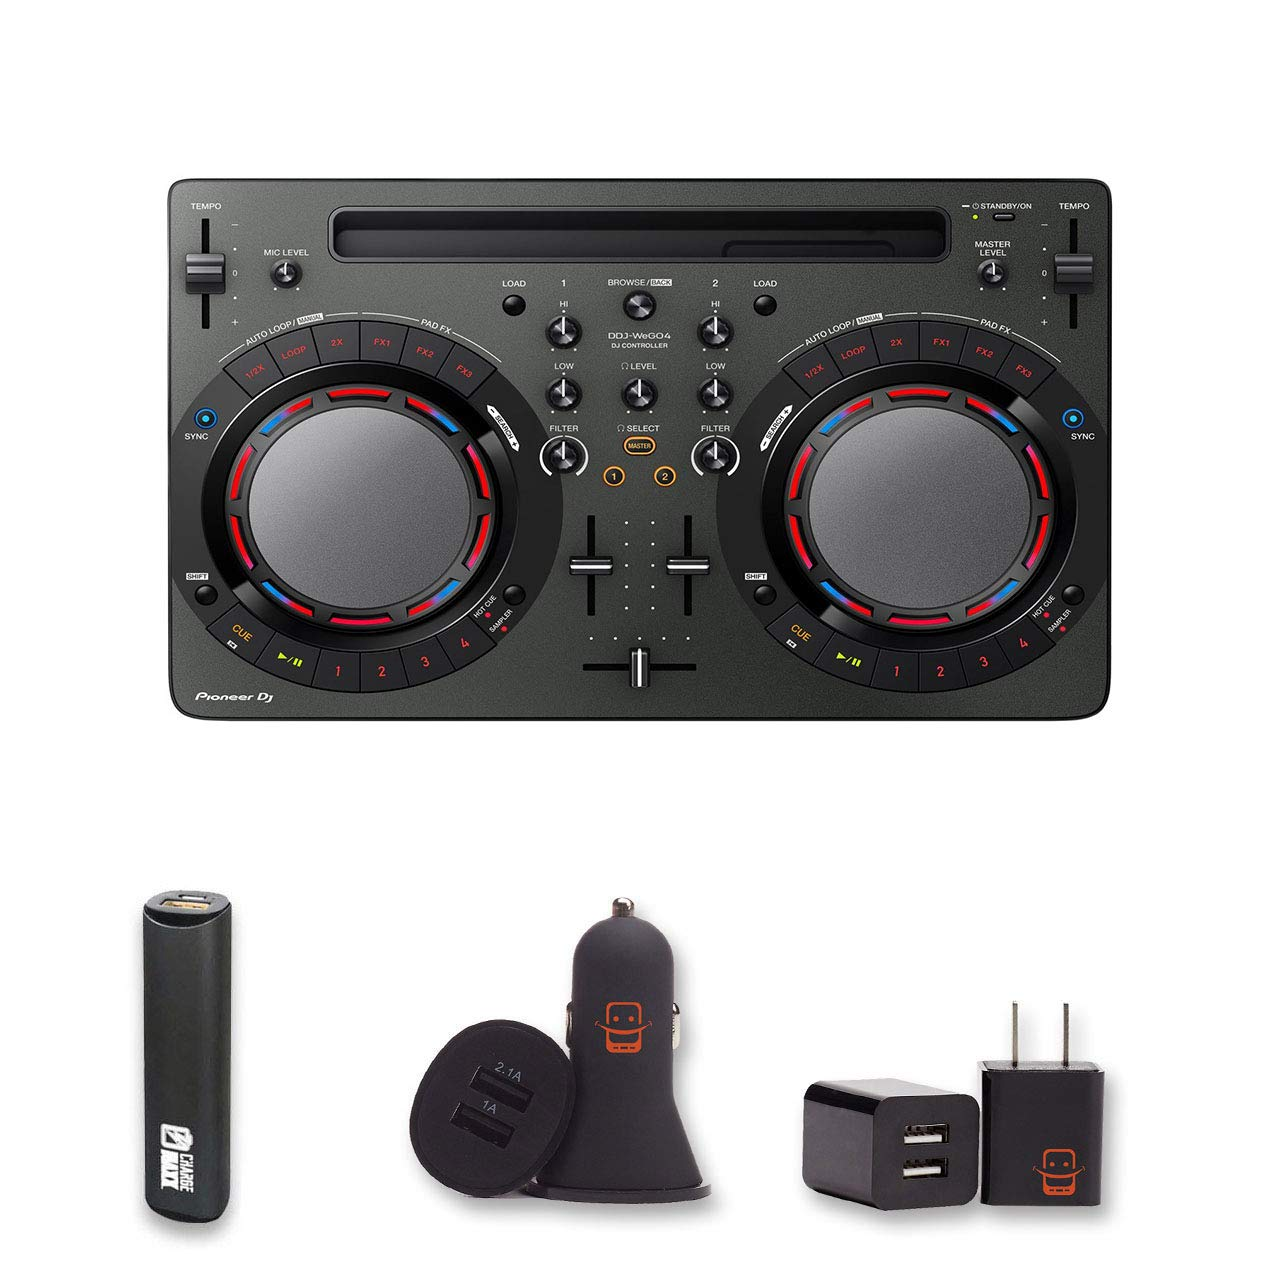 Pioneer Dj Ddj Wego4 K Controller Black With 2 Year Automobile Interior Lights Fader Warranty Powerbank Usb Car Charger Wall Ezee Bundle Musical